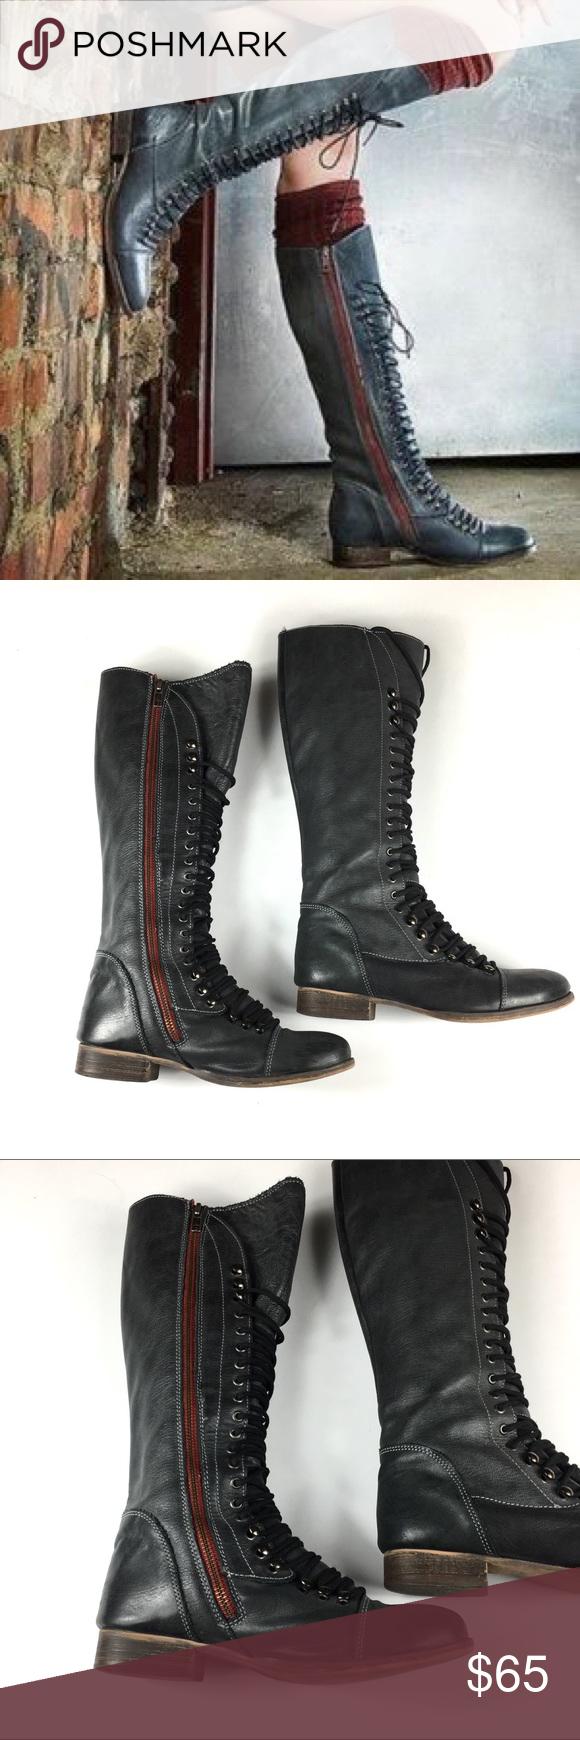 compensar caldera verdad  Steve Madden Perrin Boots | Boots, Steve madden shoes, Steve madden